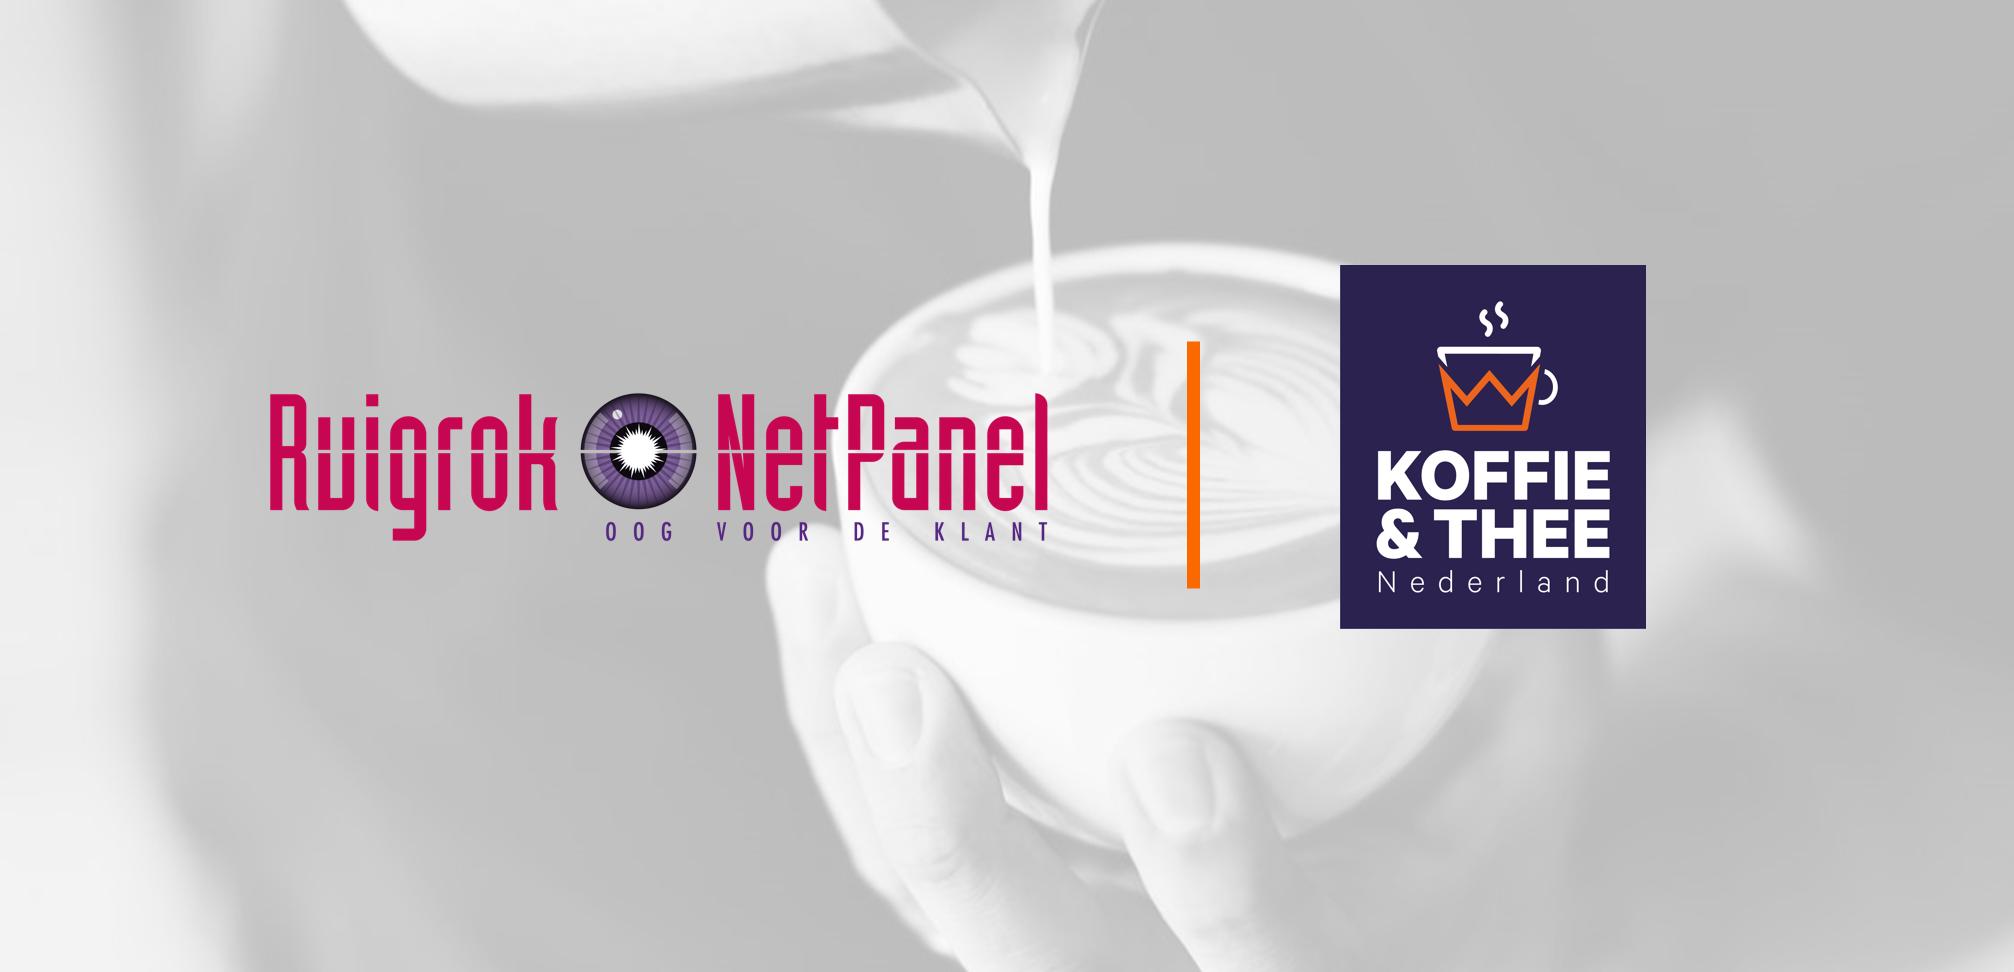 Ruigrok NetPanel   Koffie & Thee Nederland